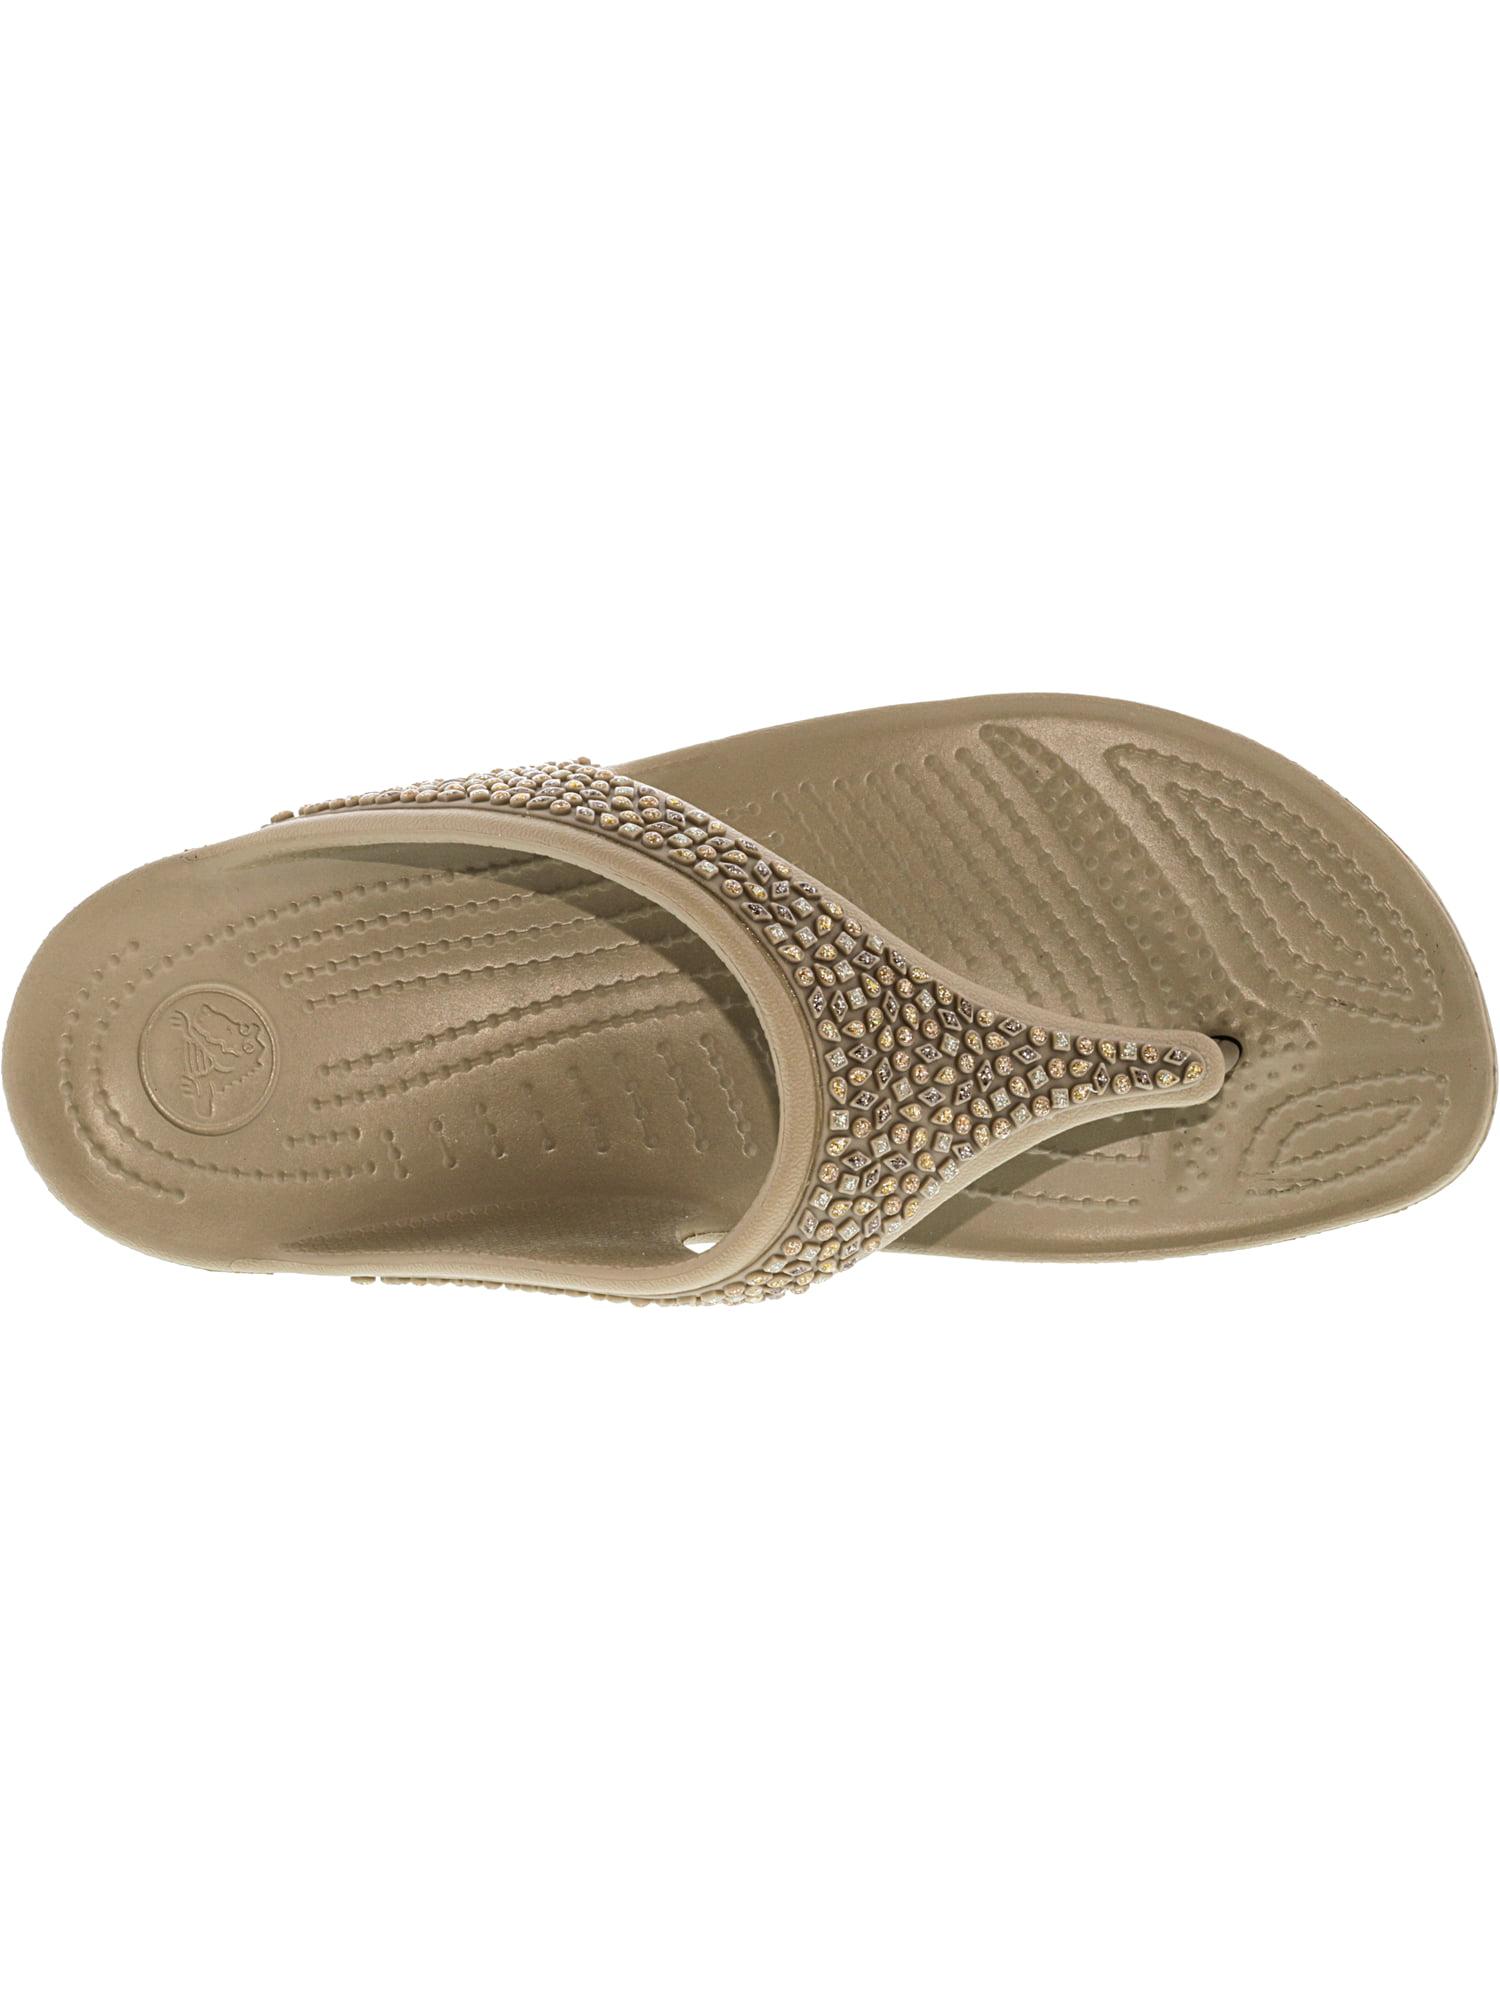 6ed2c9cc83fa8 Crocs Women s Sloane Embellished Flip Gold Metallic Sandal - 8M